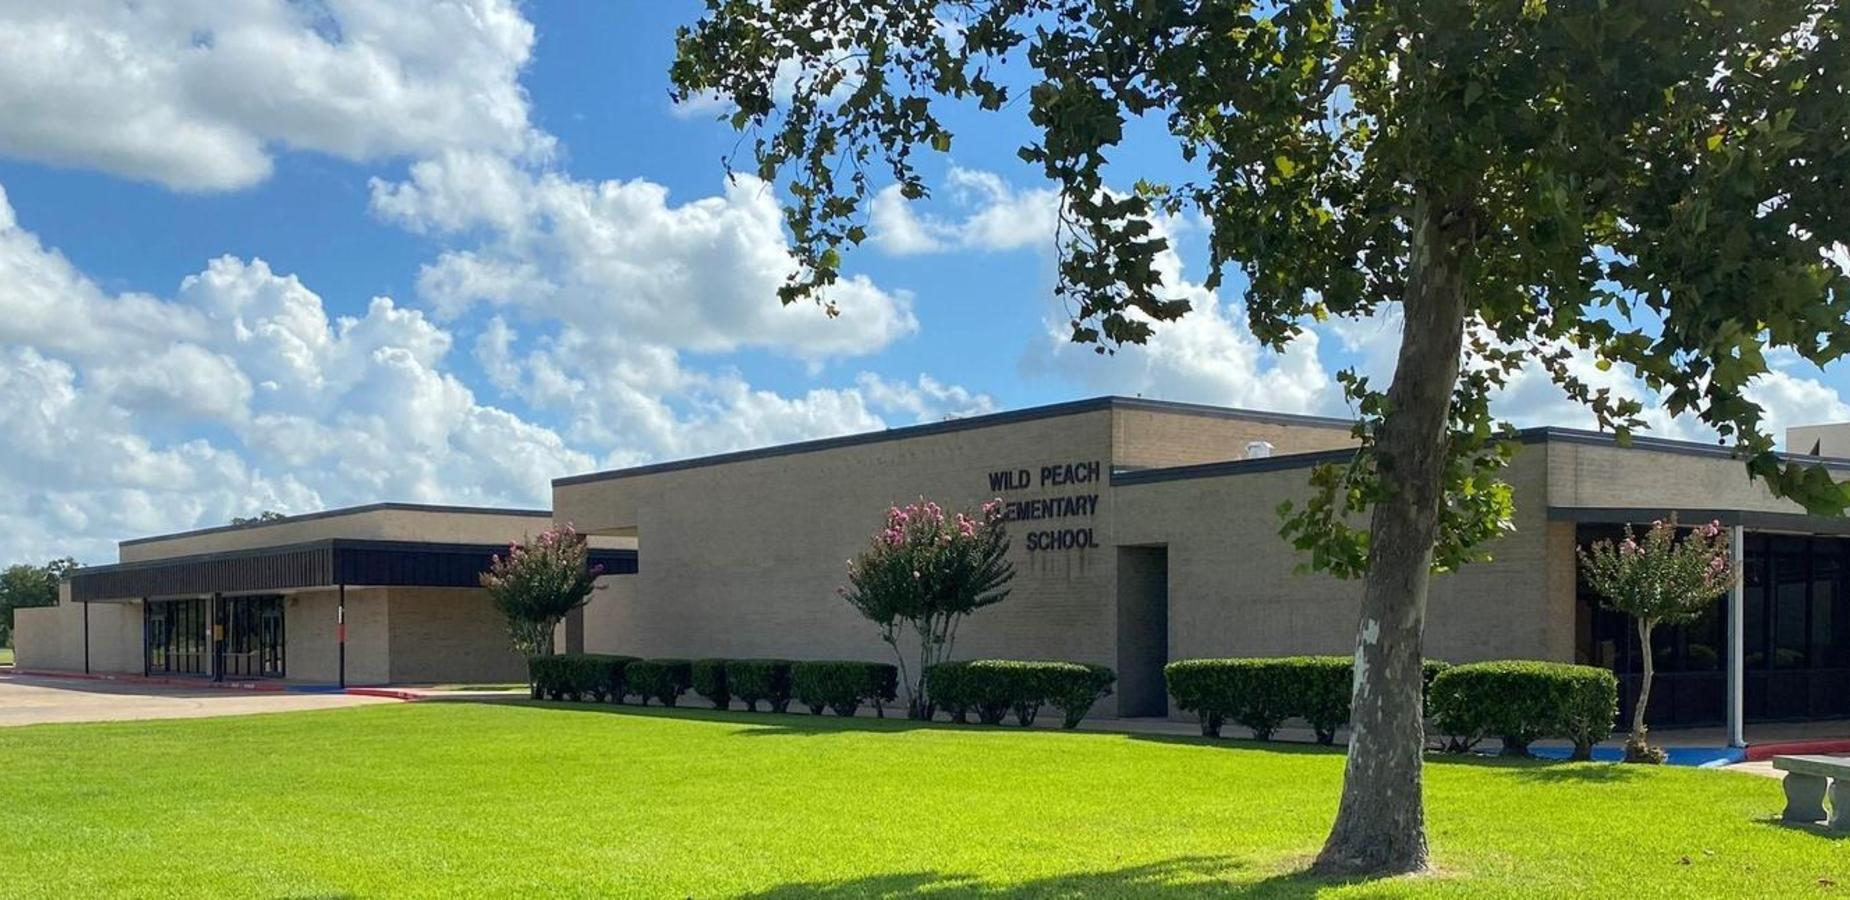 Wild Peach Elementary